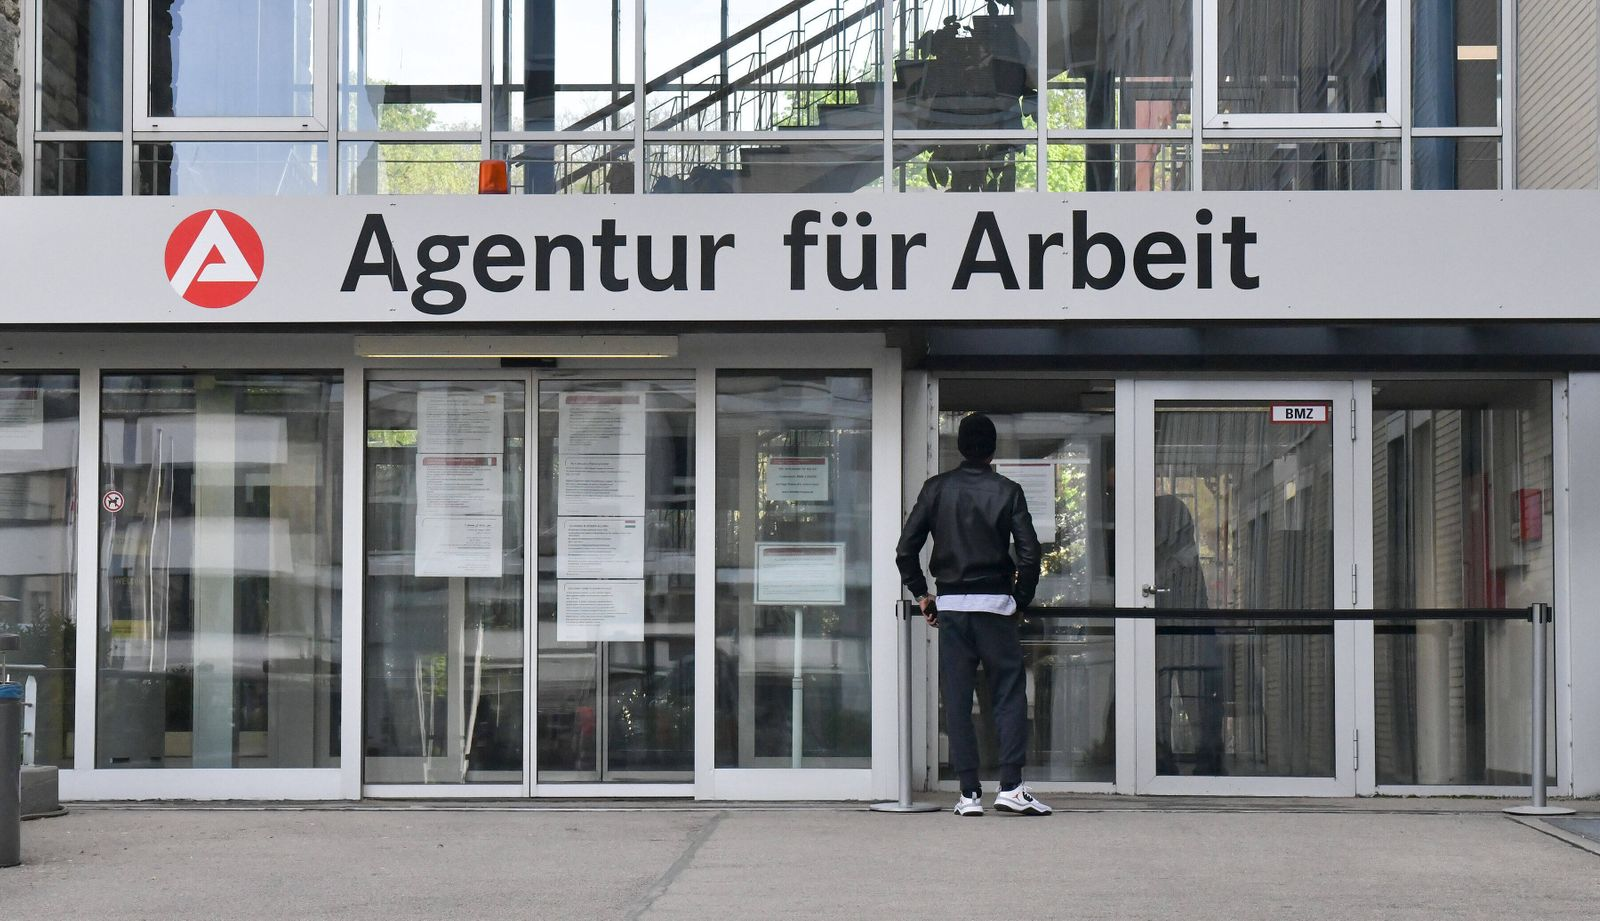 xblx, Agentur fuer Arbeit, emwirt Frankfurt *** xblx, Agency for Employment, emwirt Frankfurt